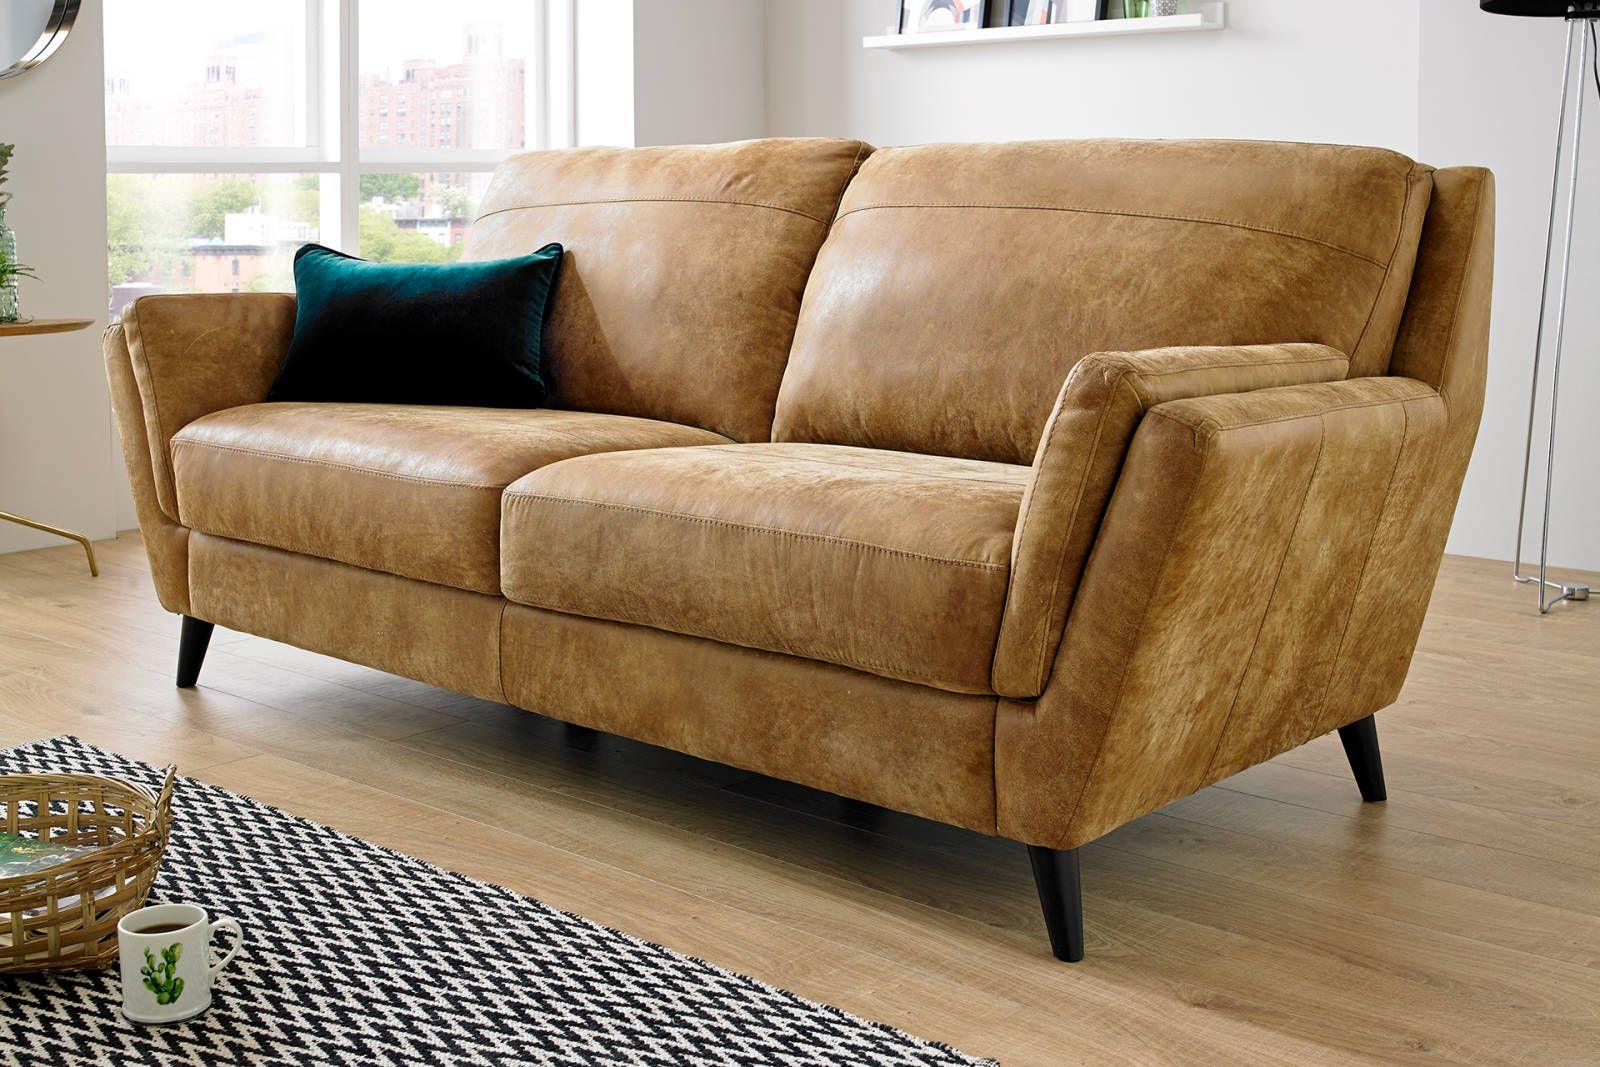 Fellini Sofology Sofa Tan Leather Sofas Living Room Style